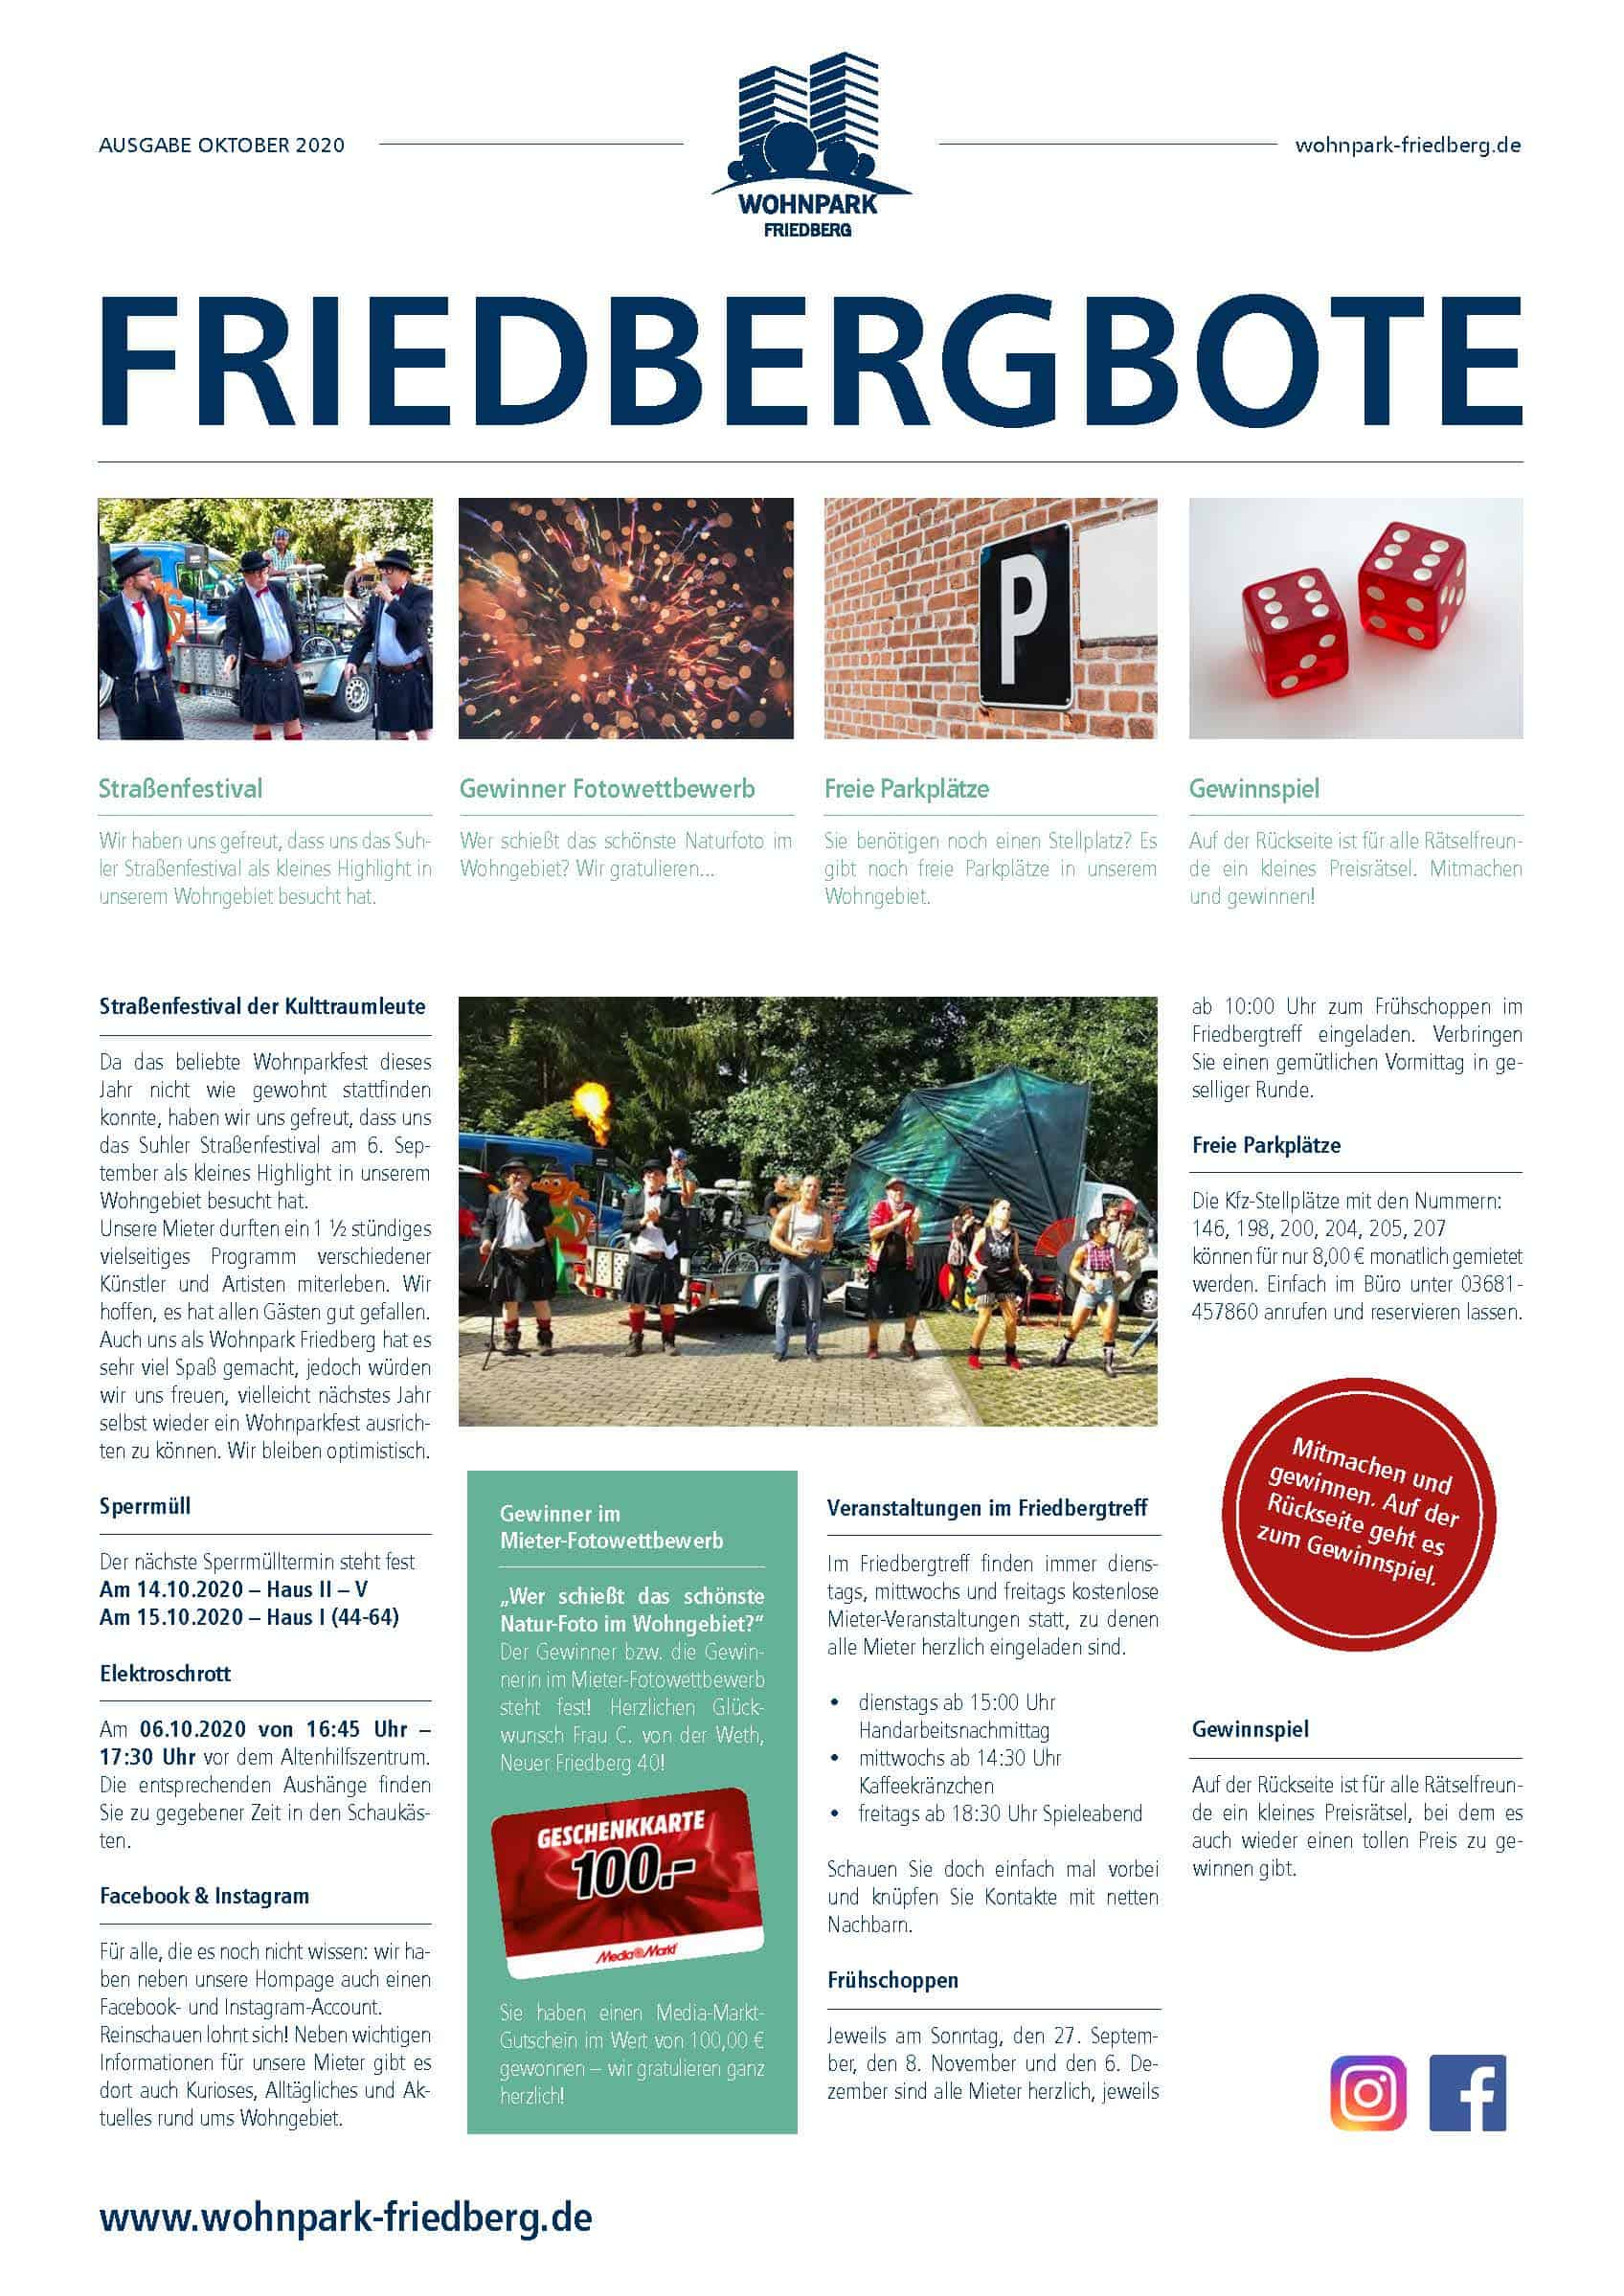 Friedbergbote – Oktober 2020